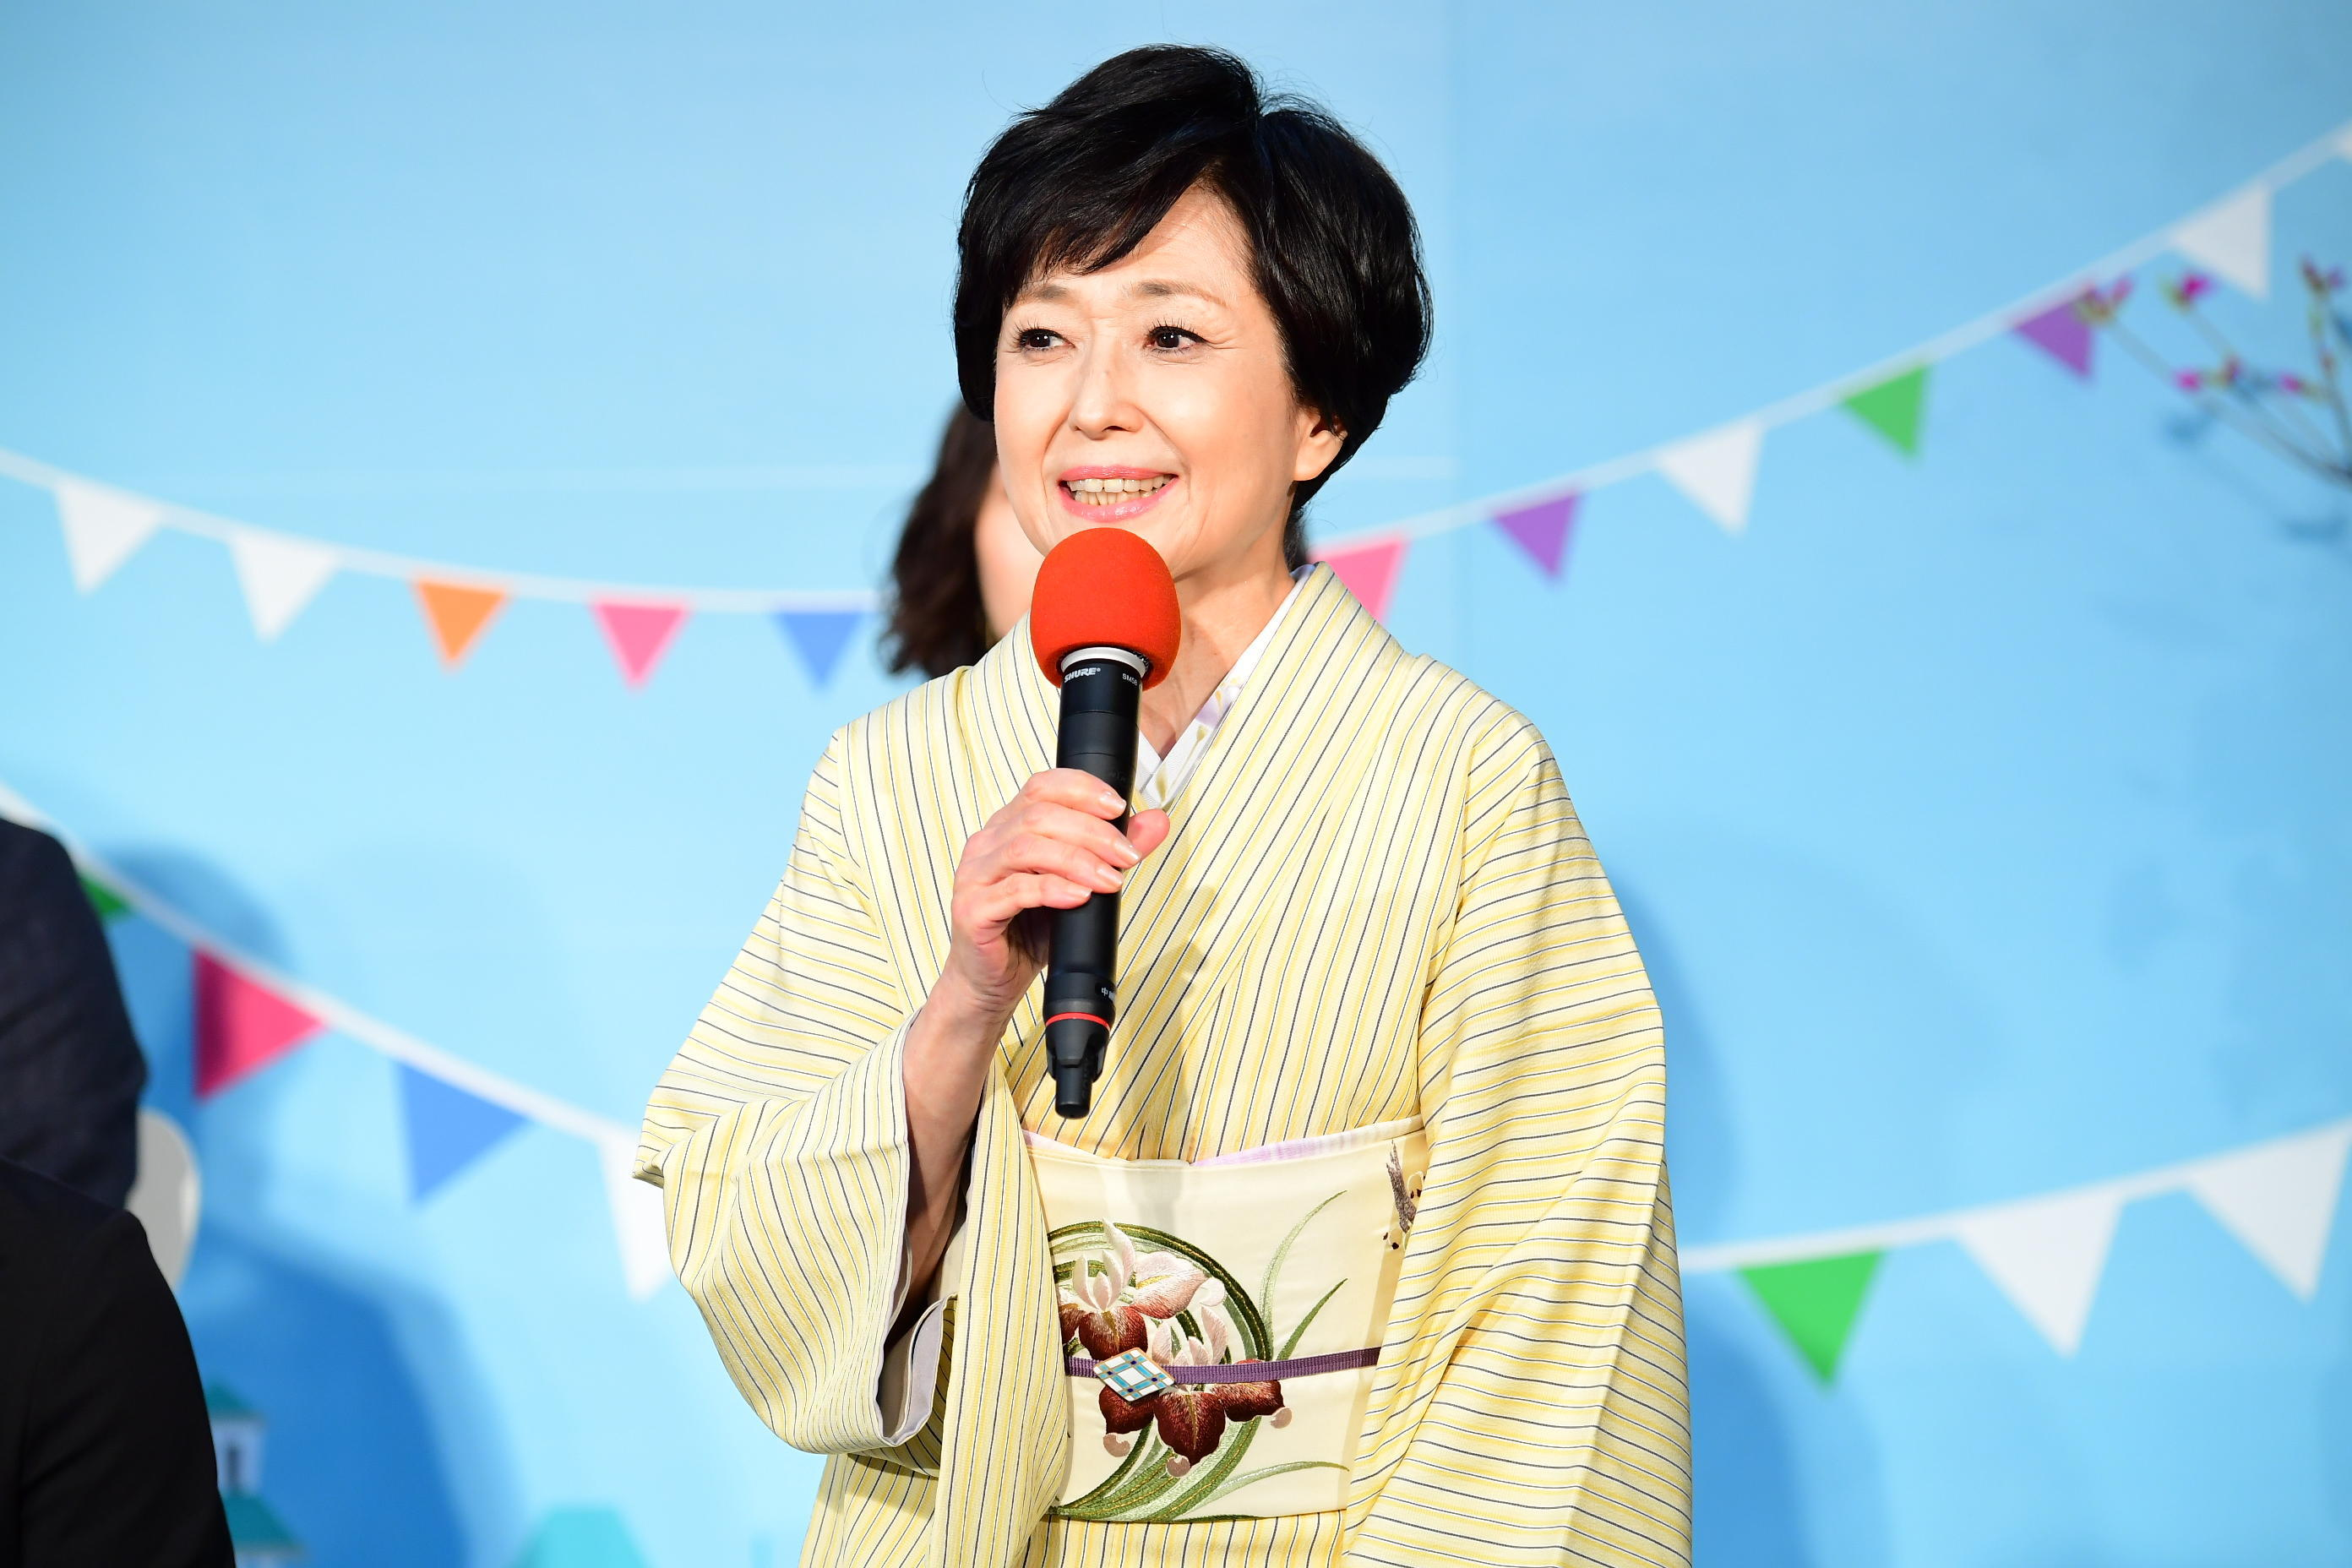 http://news.yoshimoto.co.jp/20170420183315-dddb49d1242b990099b06ad7c5c0a8ce1544697a.jpg